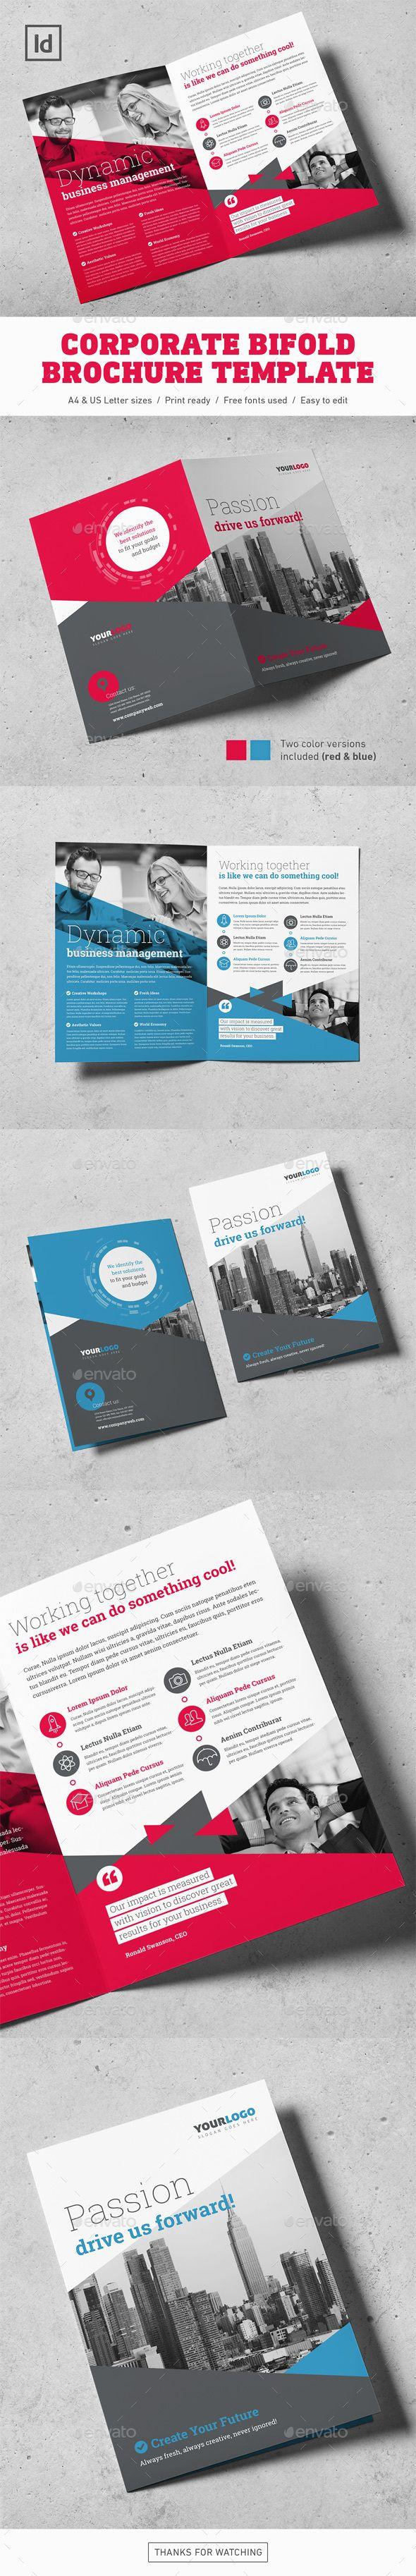 Corporate Bifold Brochure Template — InDesign INDD #8.5x11 #bi fold • Downlo...